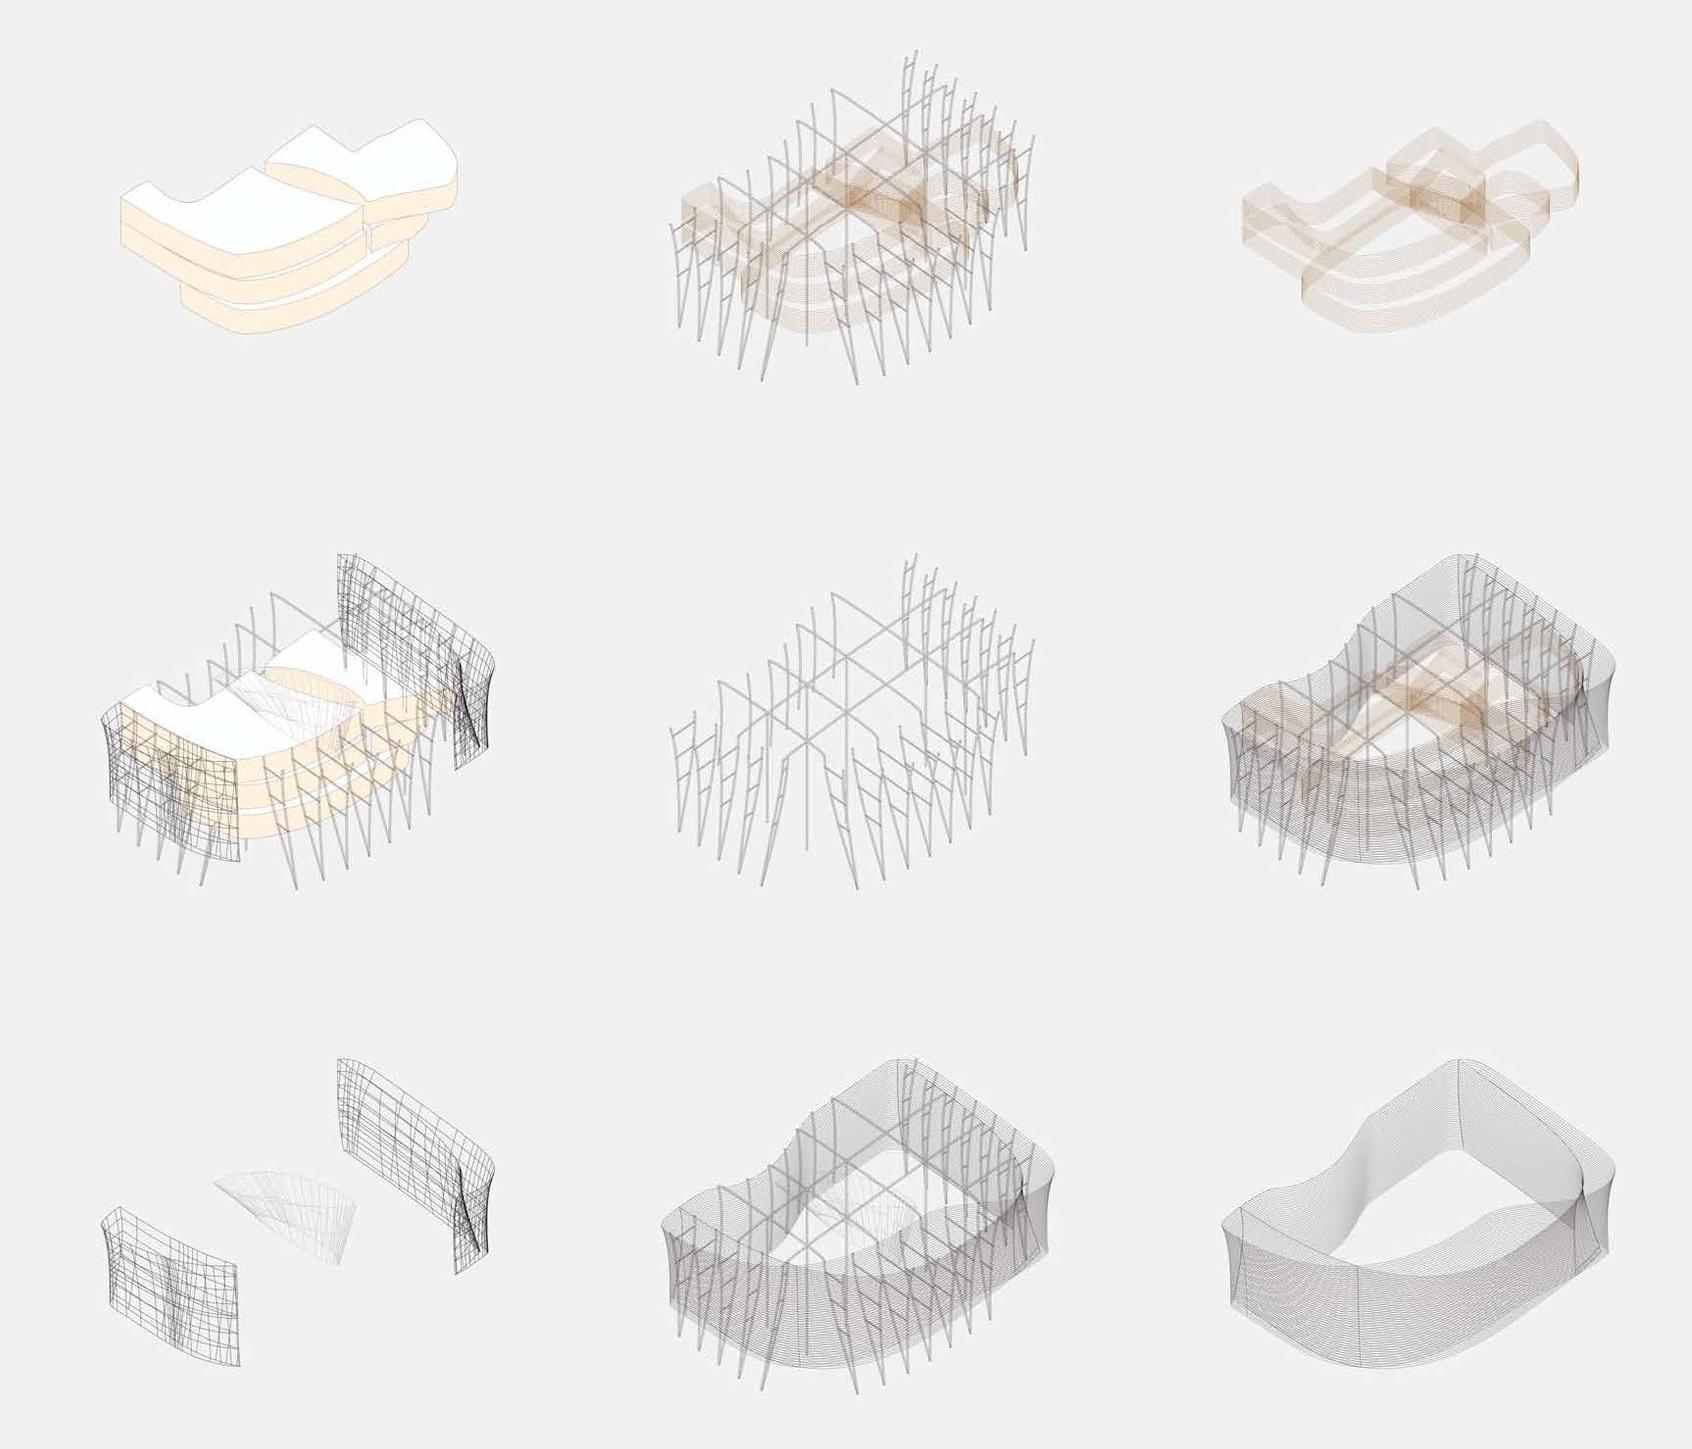 Program/structure/experience/facade/light